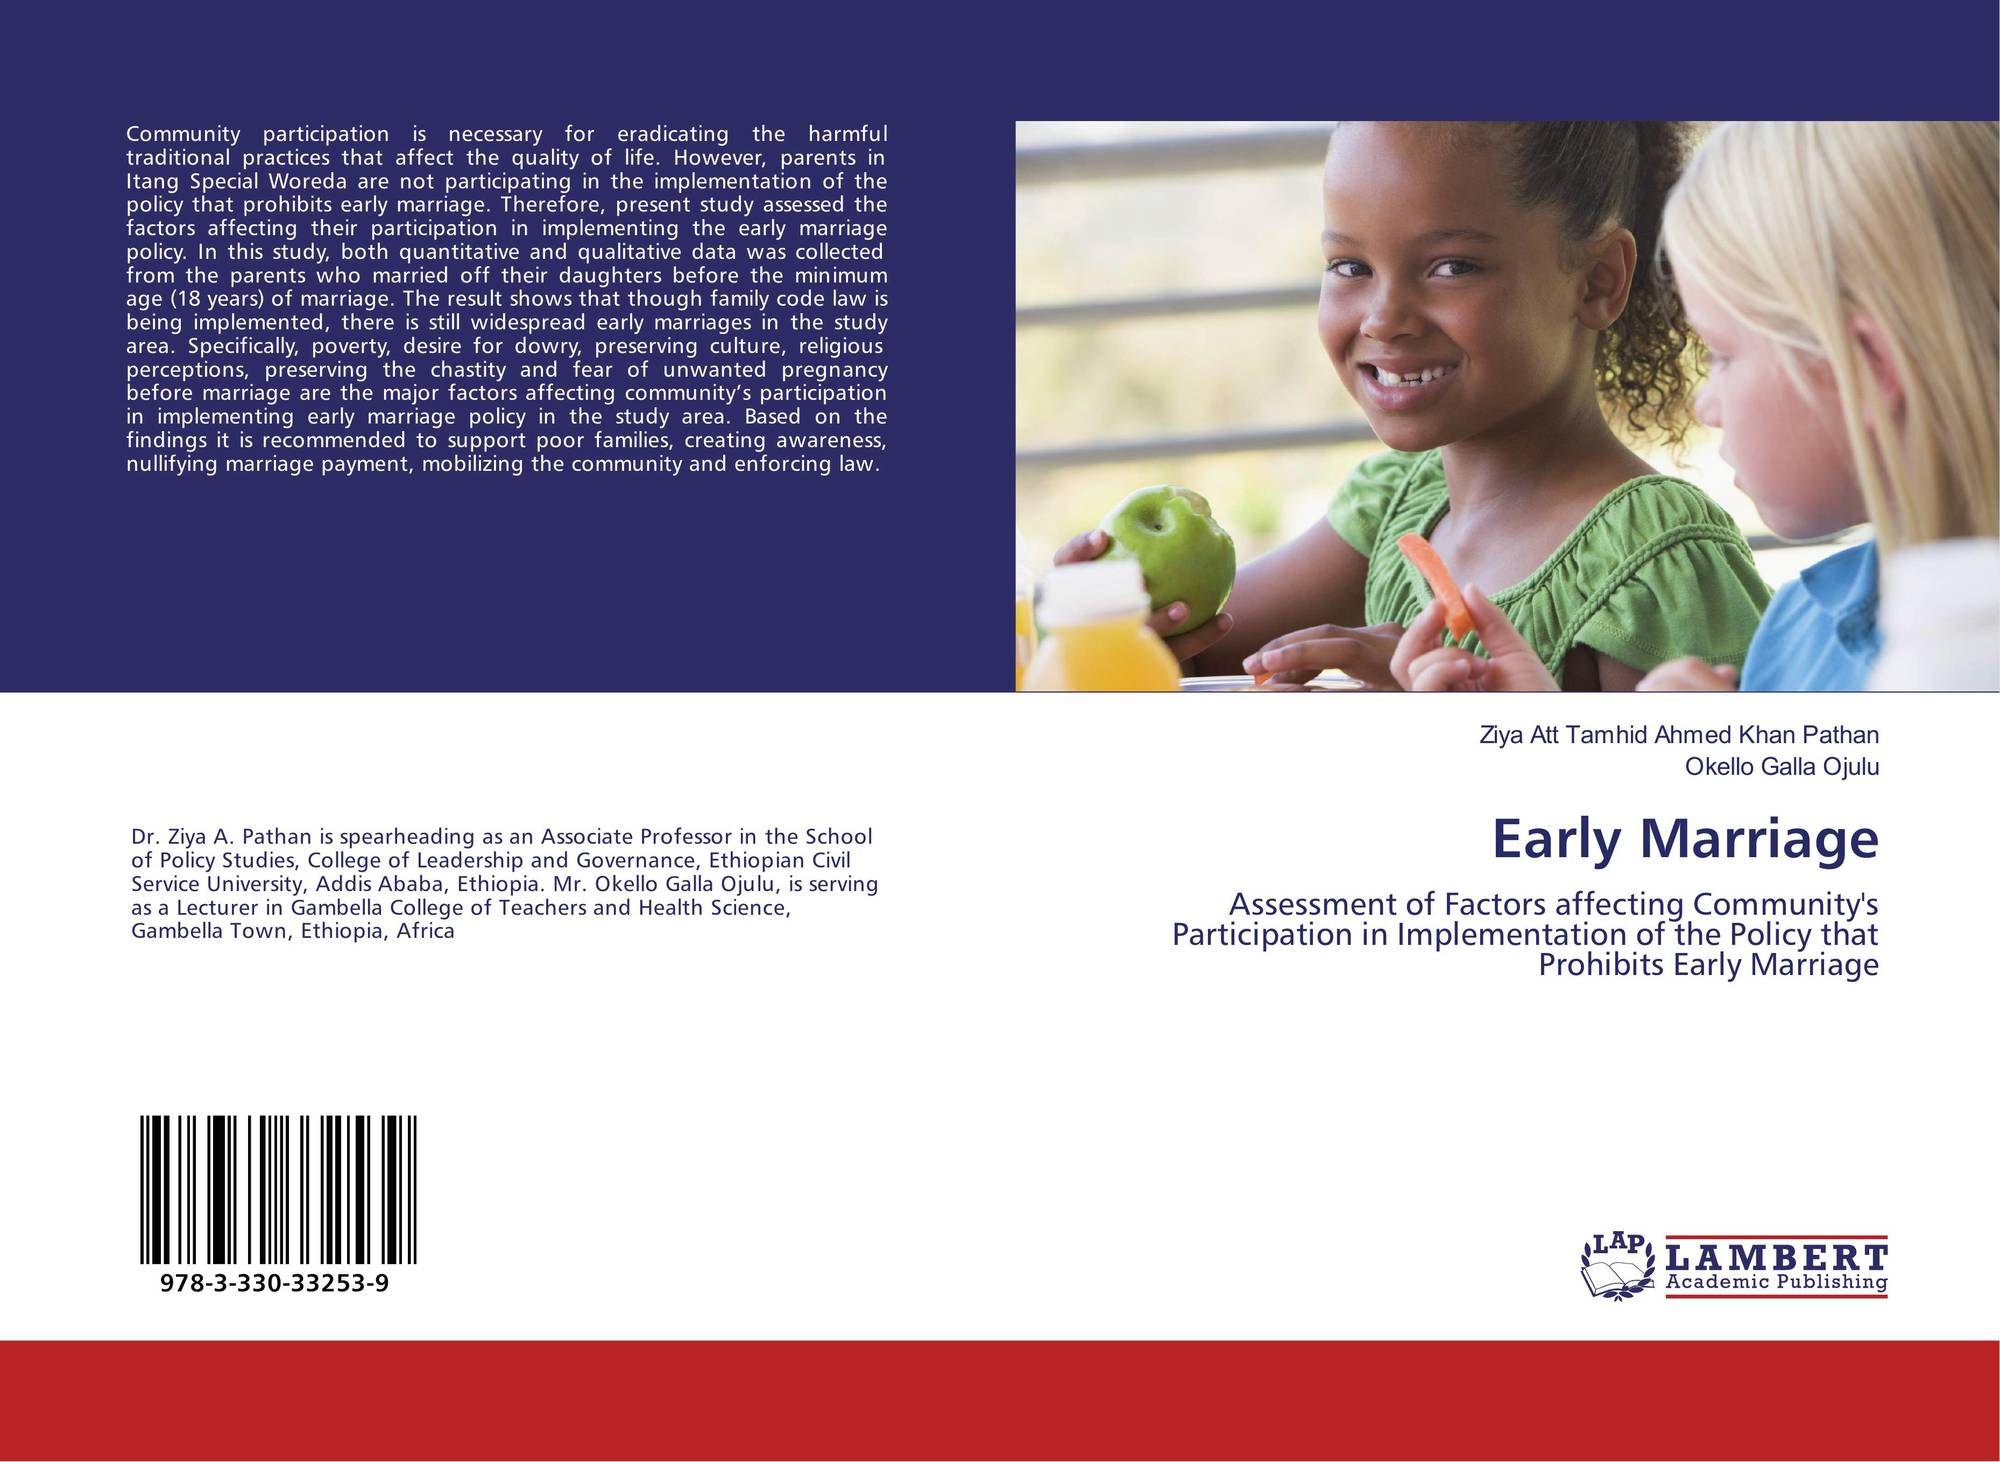 Early Marriage, 978-3-330-33253-9, 3330332530 ,9783330332539 by Ziya